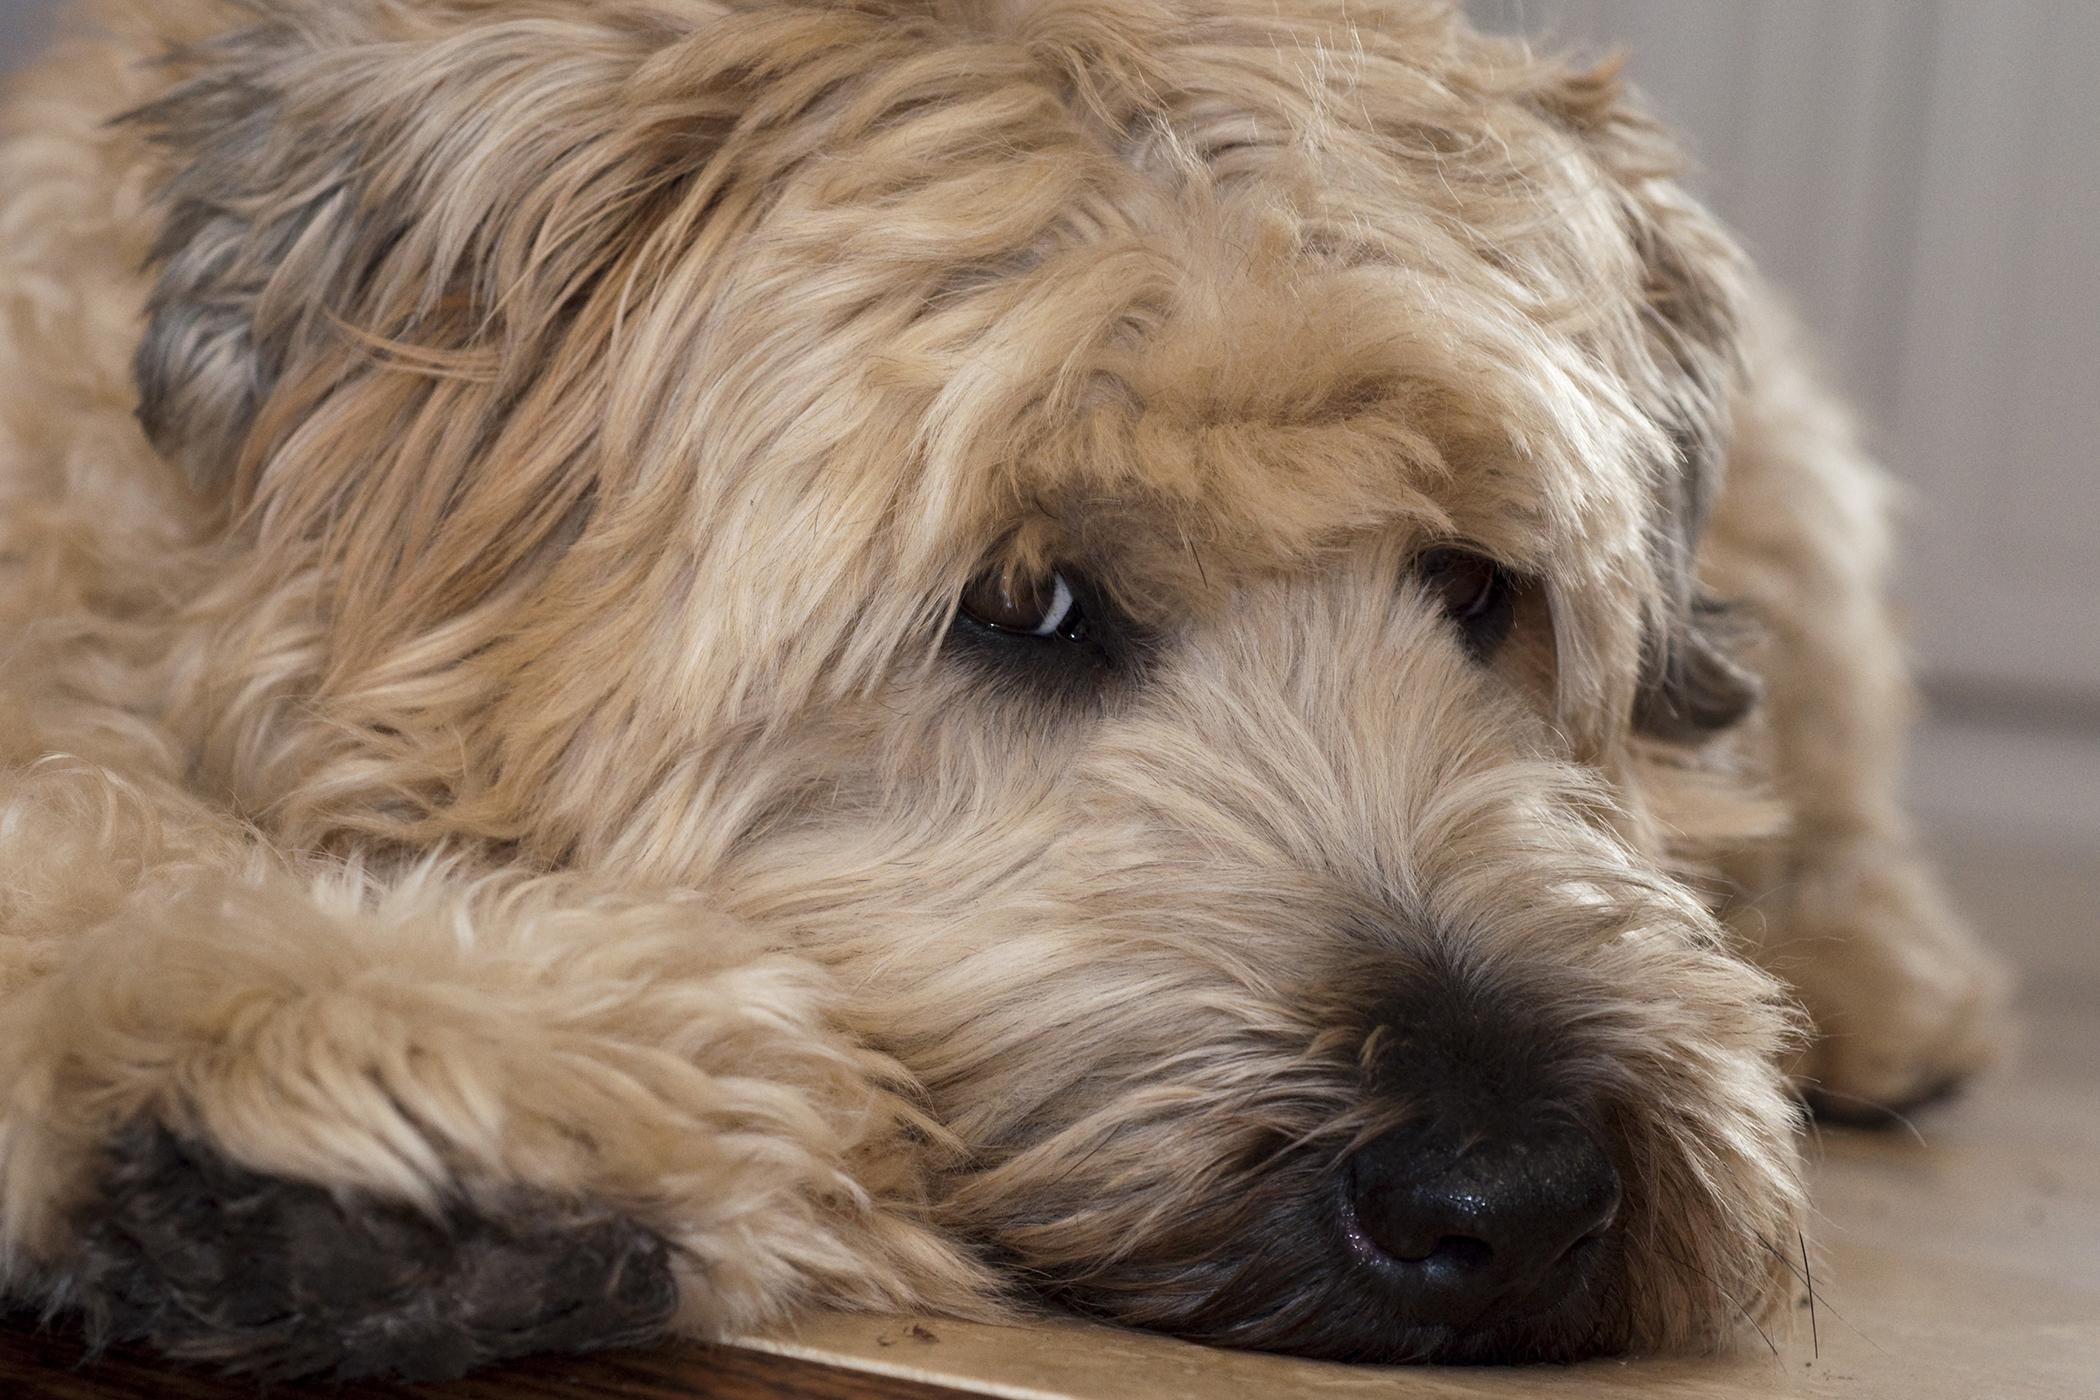 Gastrointestinal Biopsy in Dogs